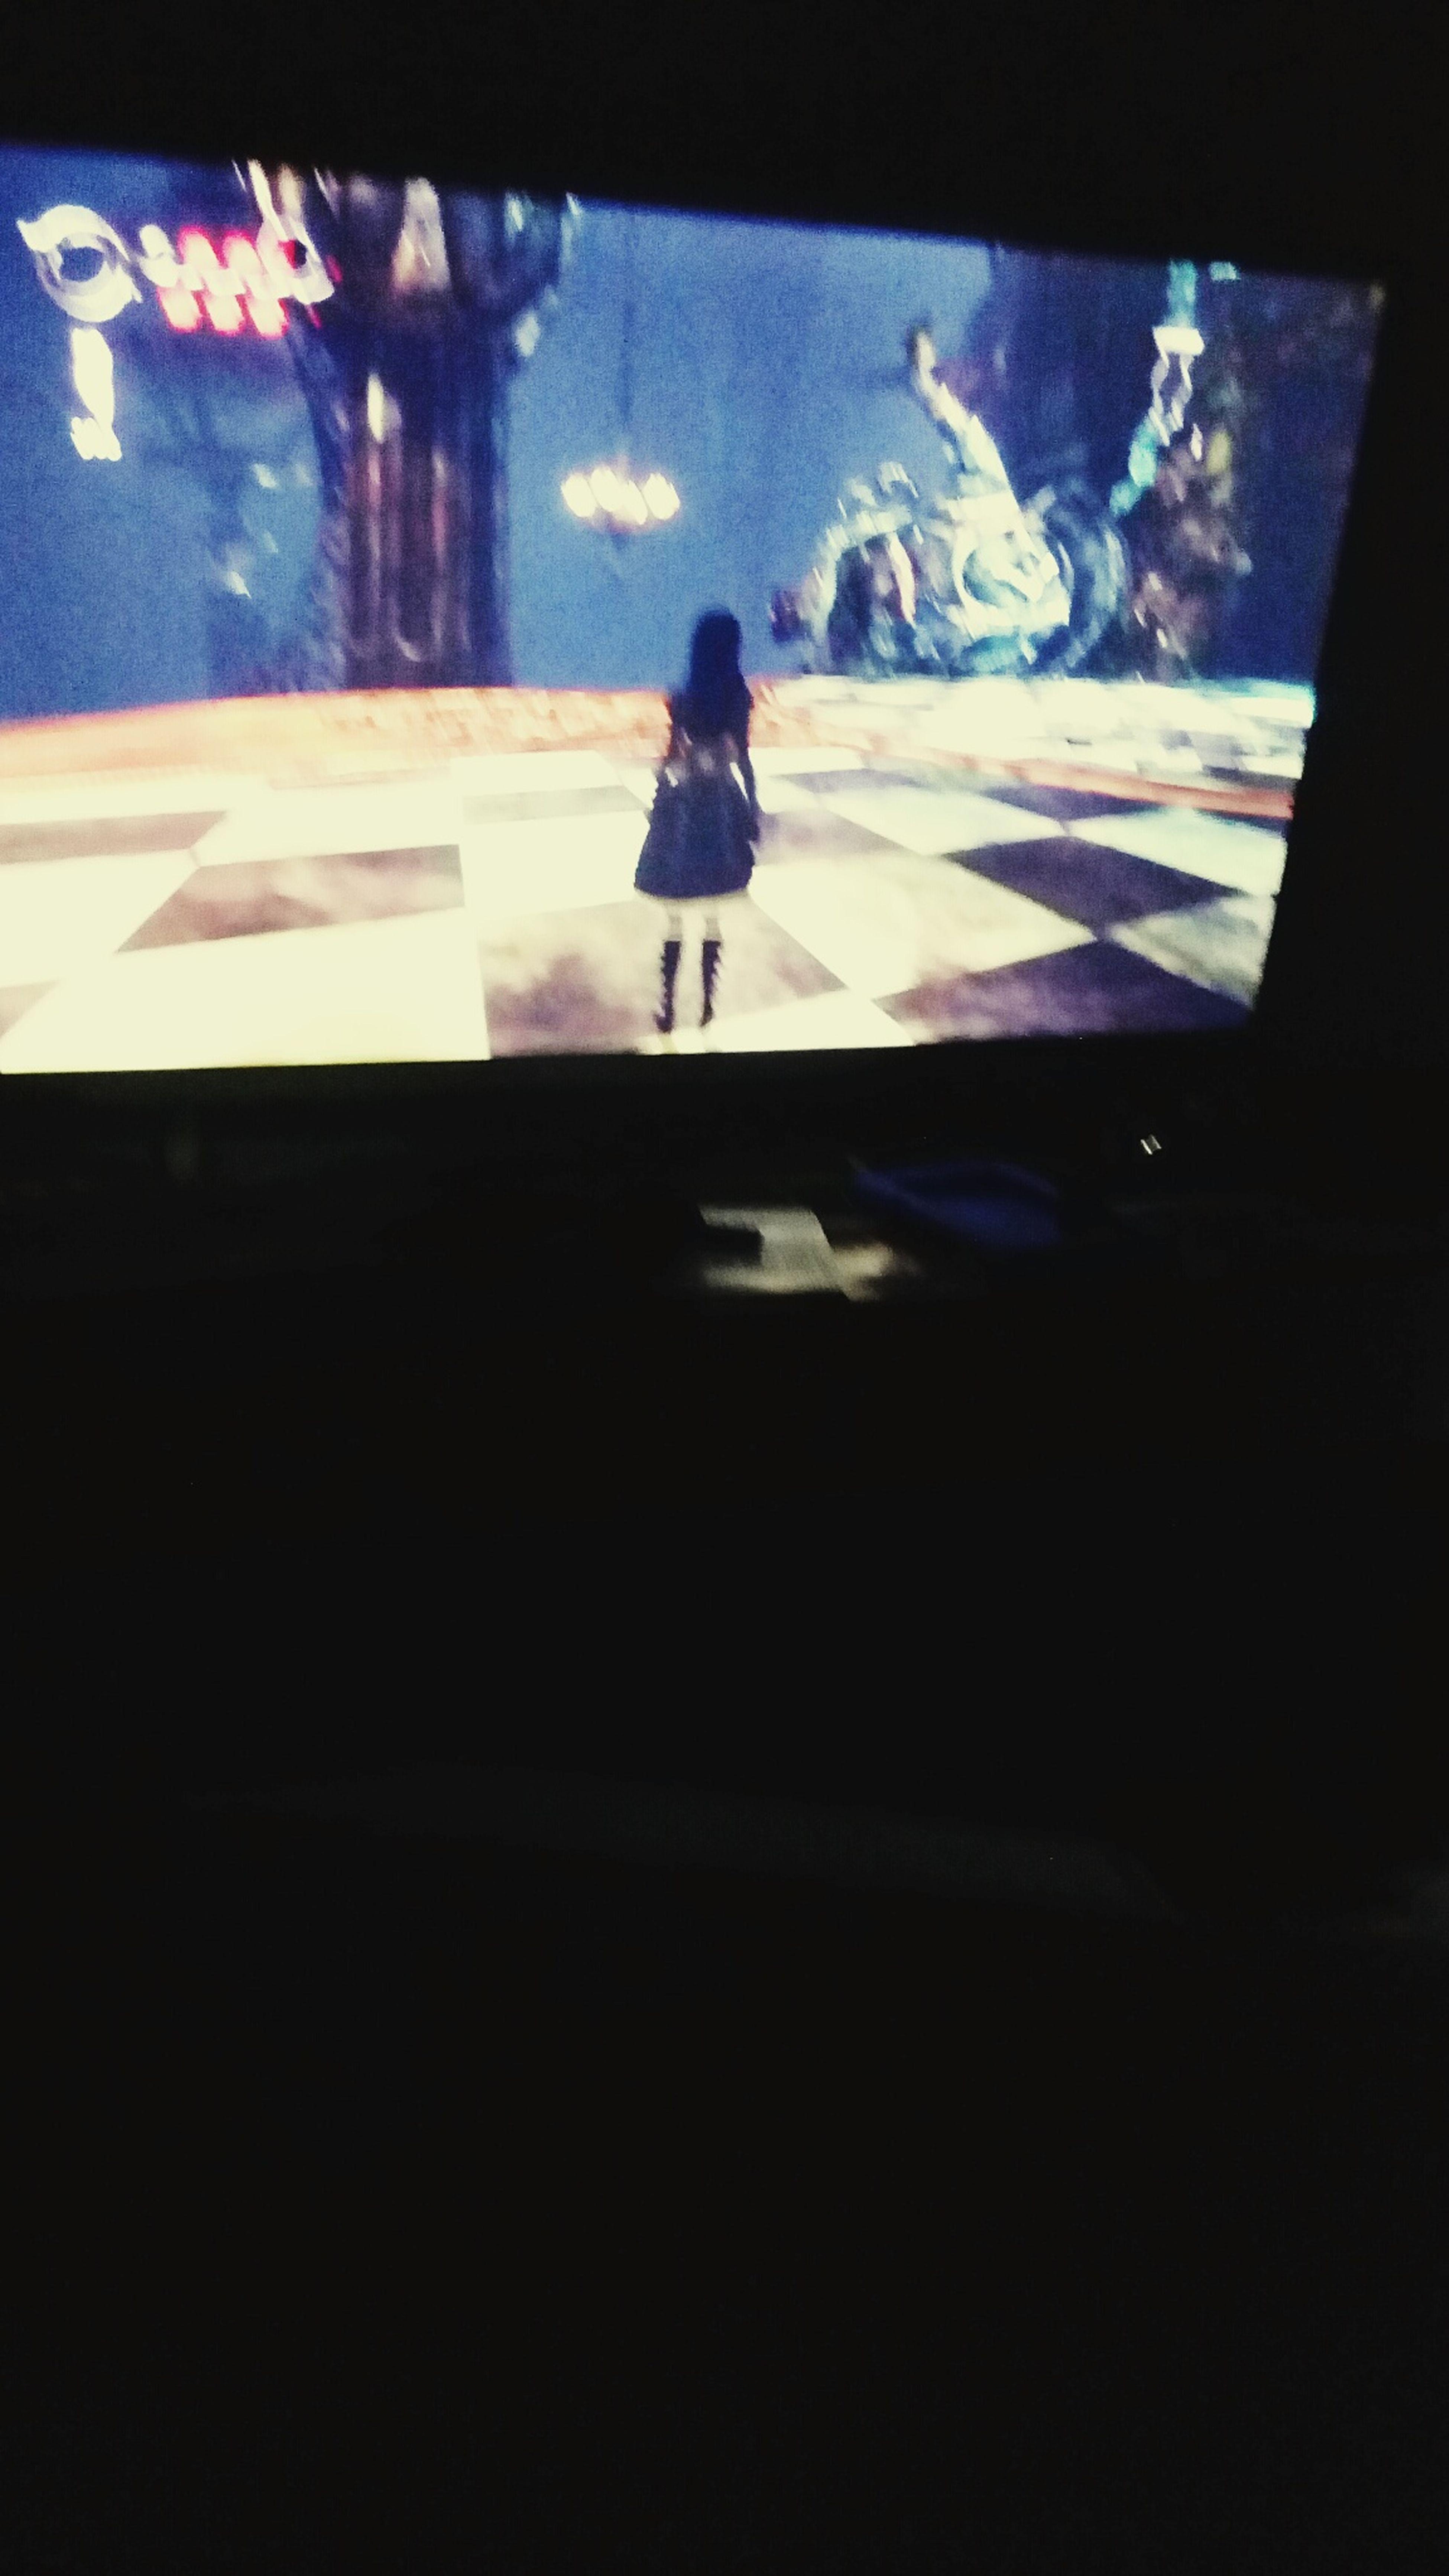 Xbox Alice Madness Return Strange I Like This Help